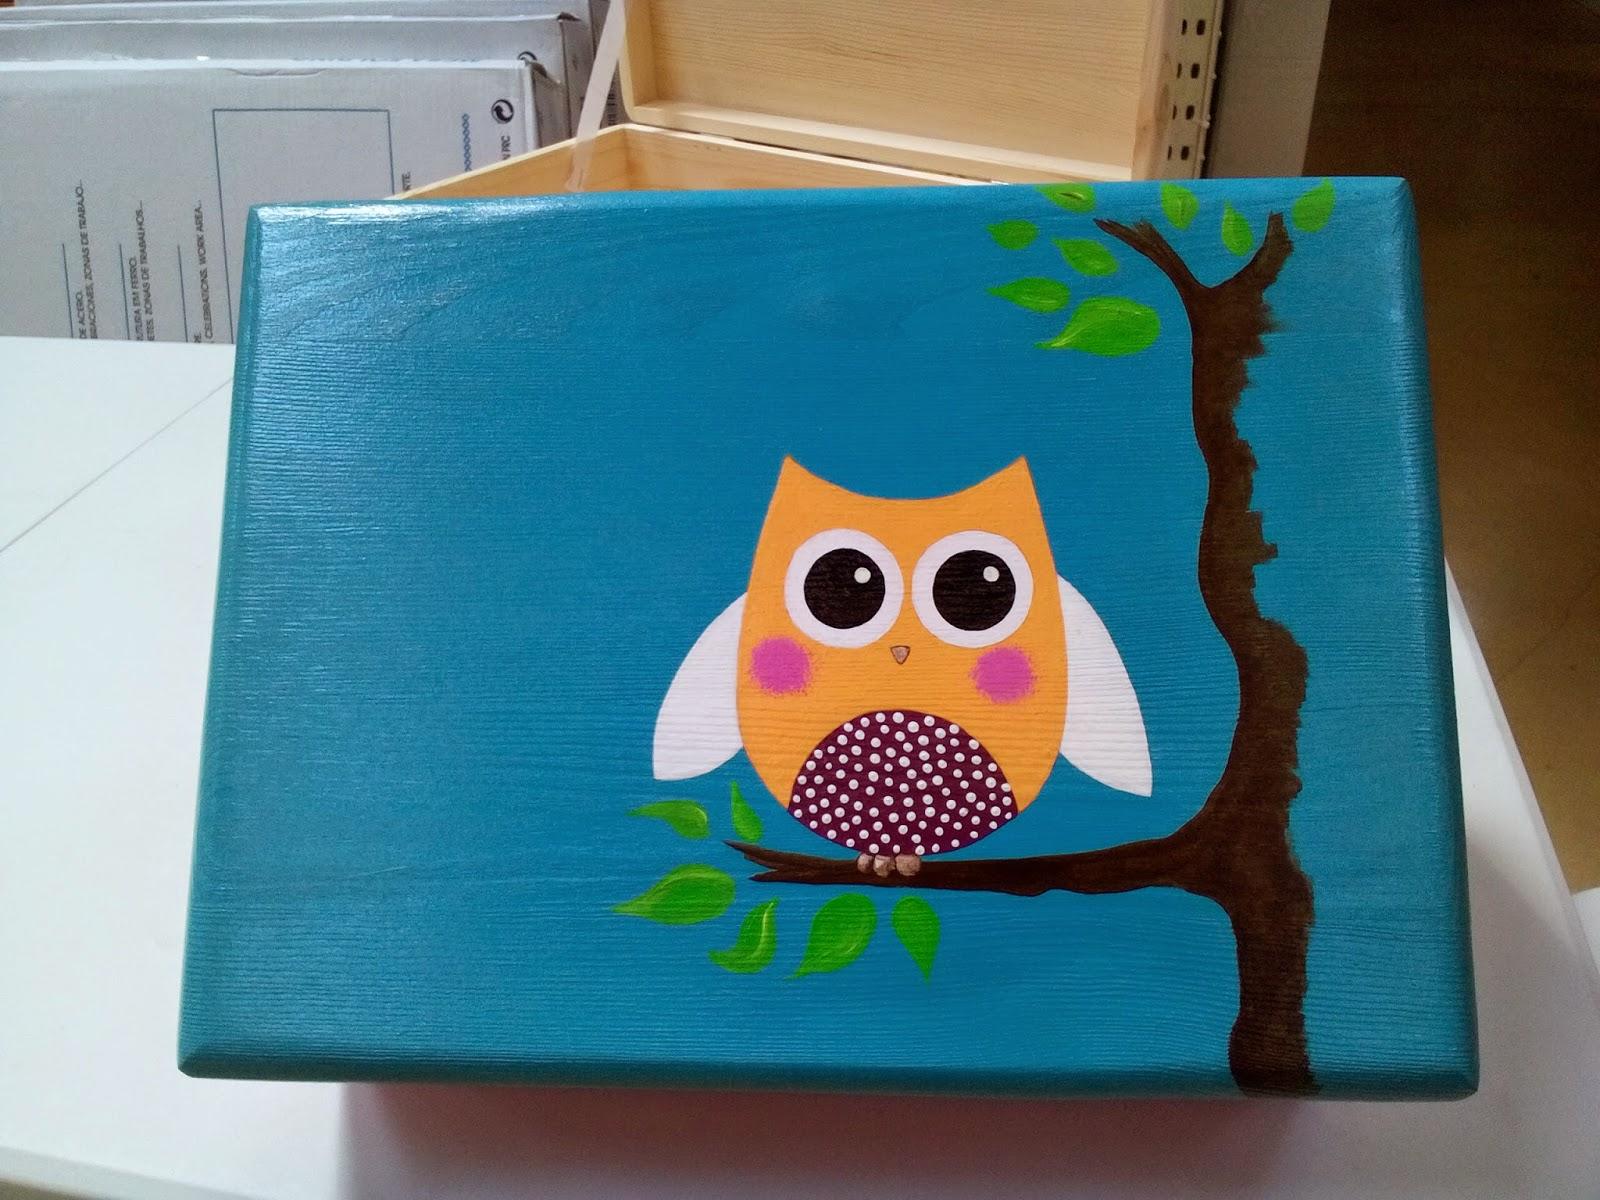 Pintar cajas de madera personalizadas - Dibujos para decorar cajas de madera ...